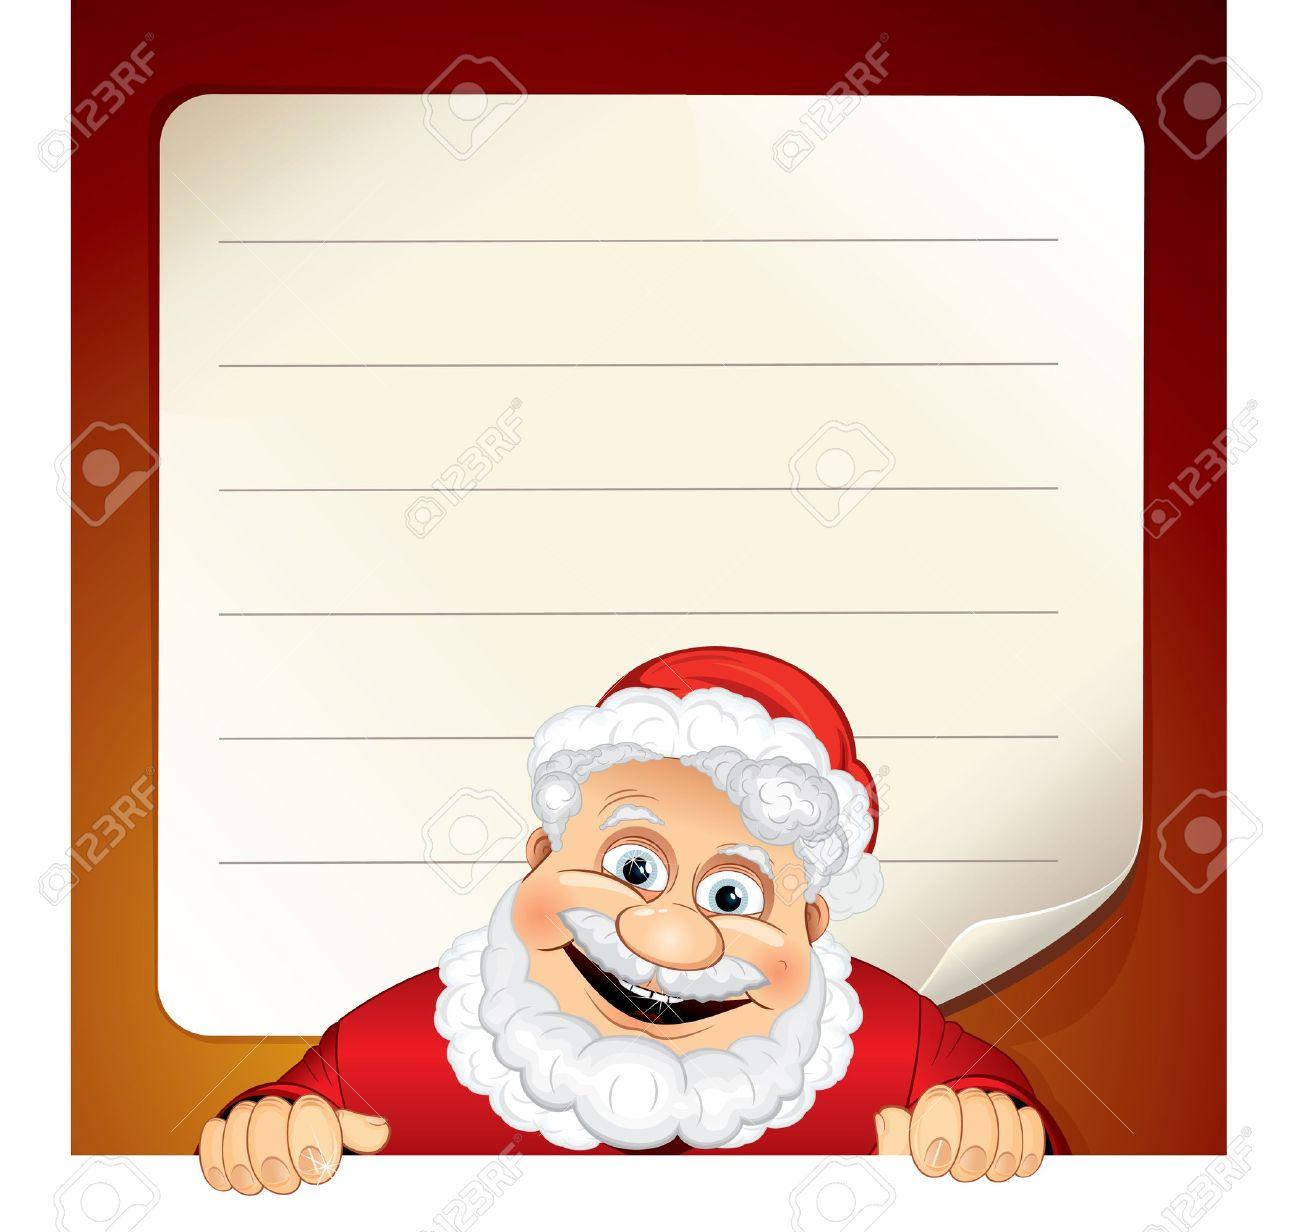 Santa wish list clipart vector free Vector Illustration Of Cartoon Santa Claus And Blank Wish List ... vector free